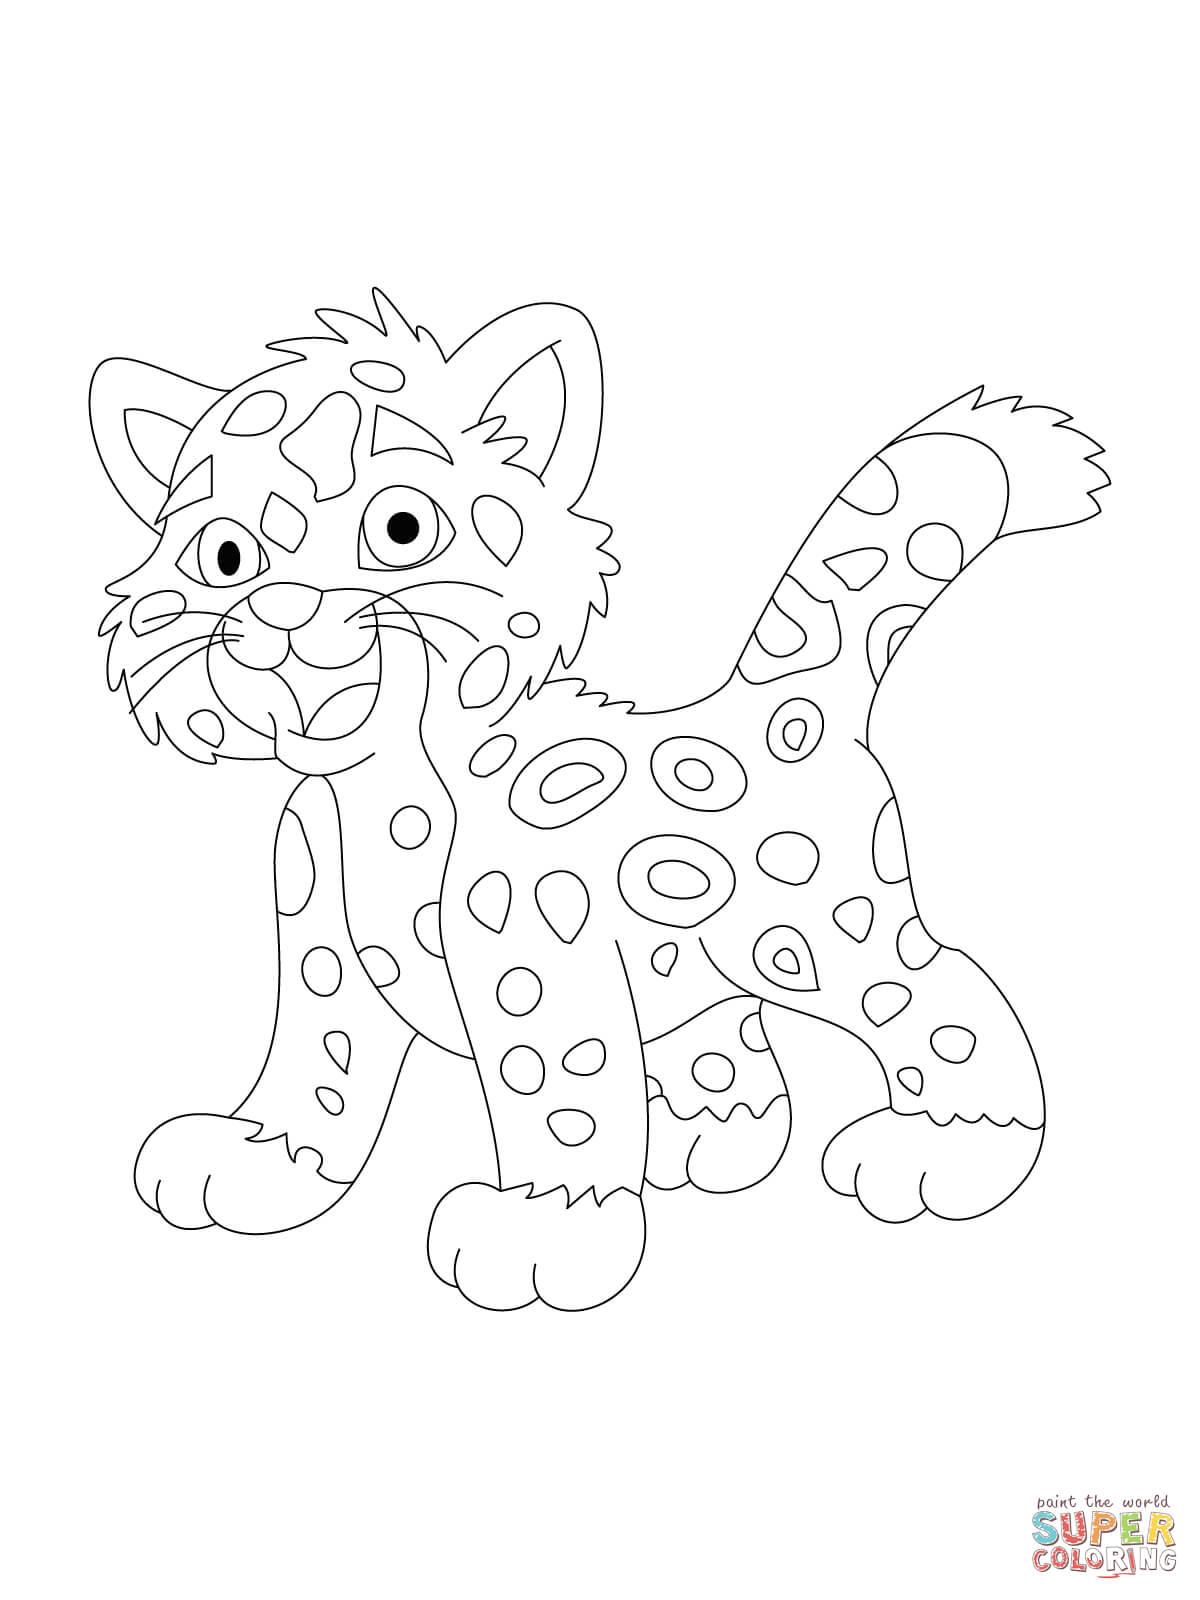 Jaguar Face Outline Sketch Coloring Page